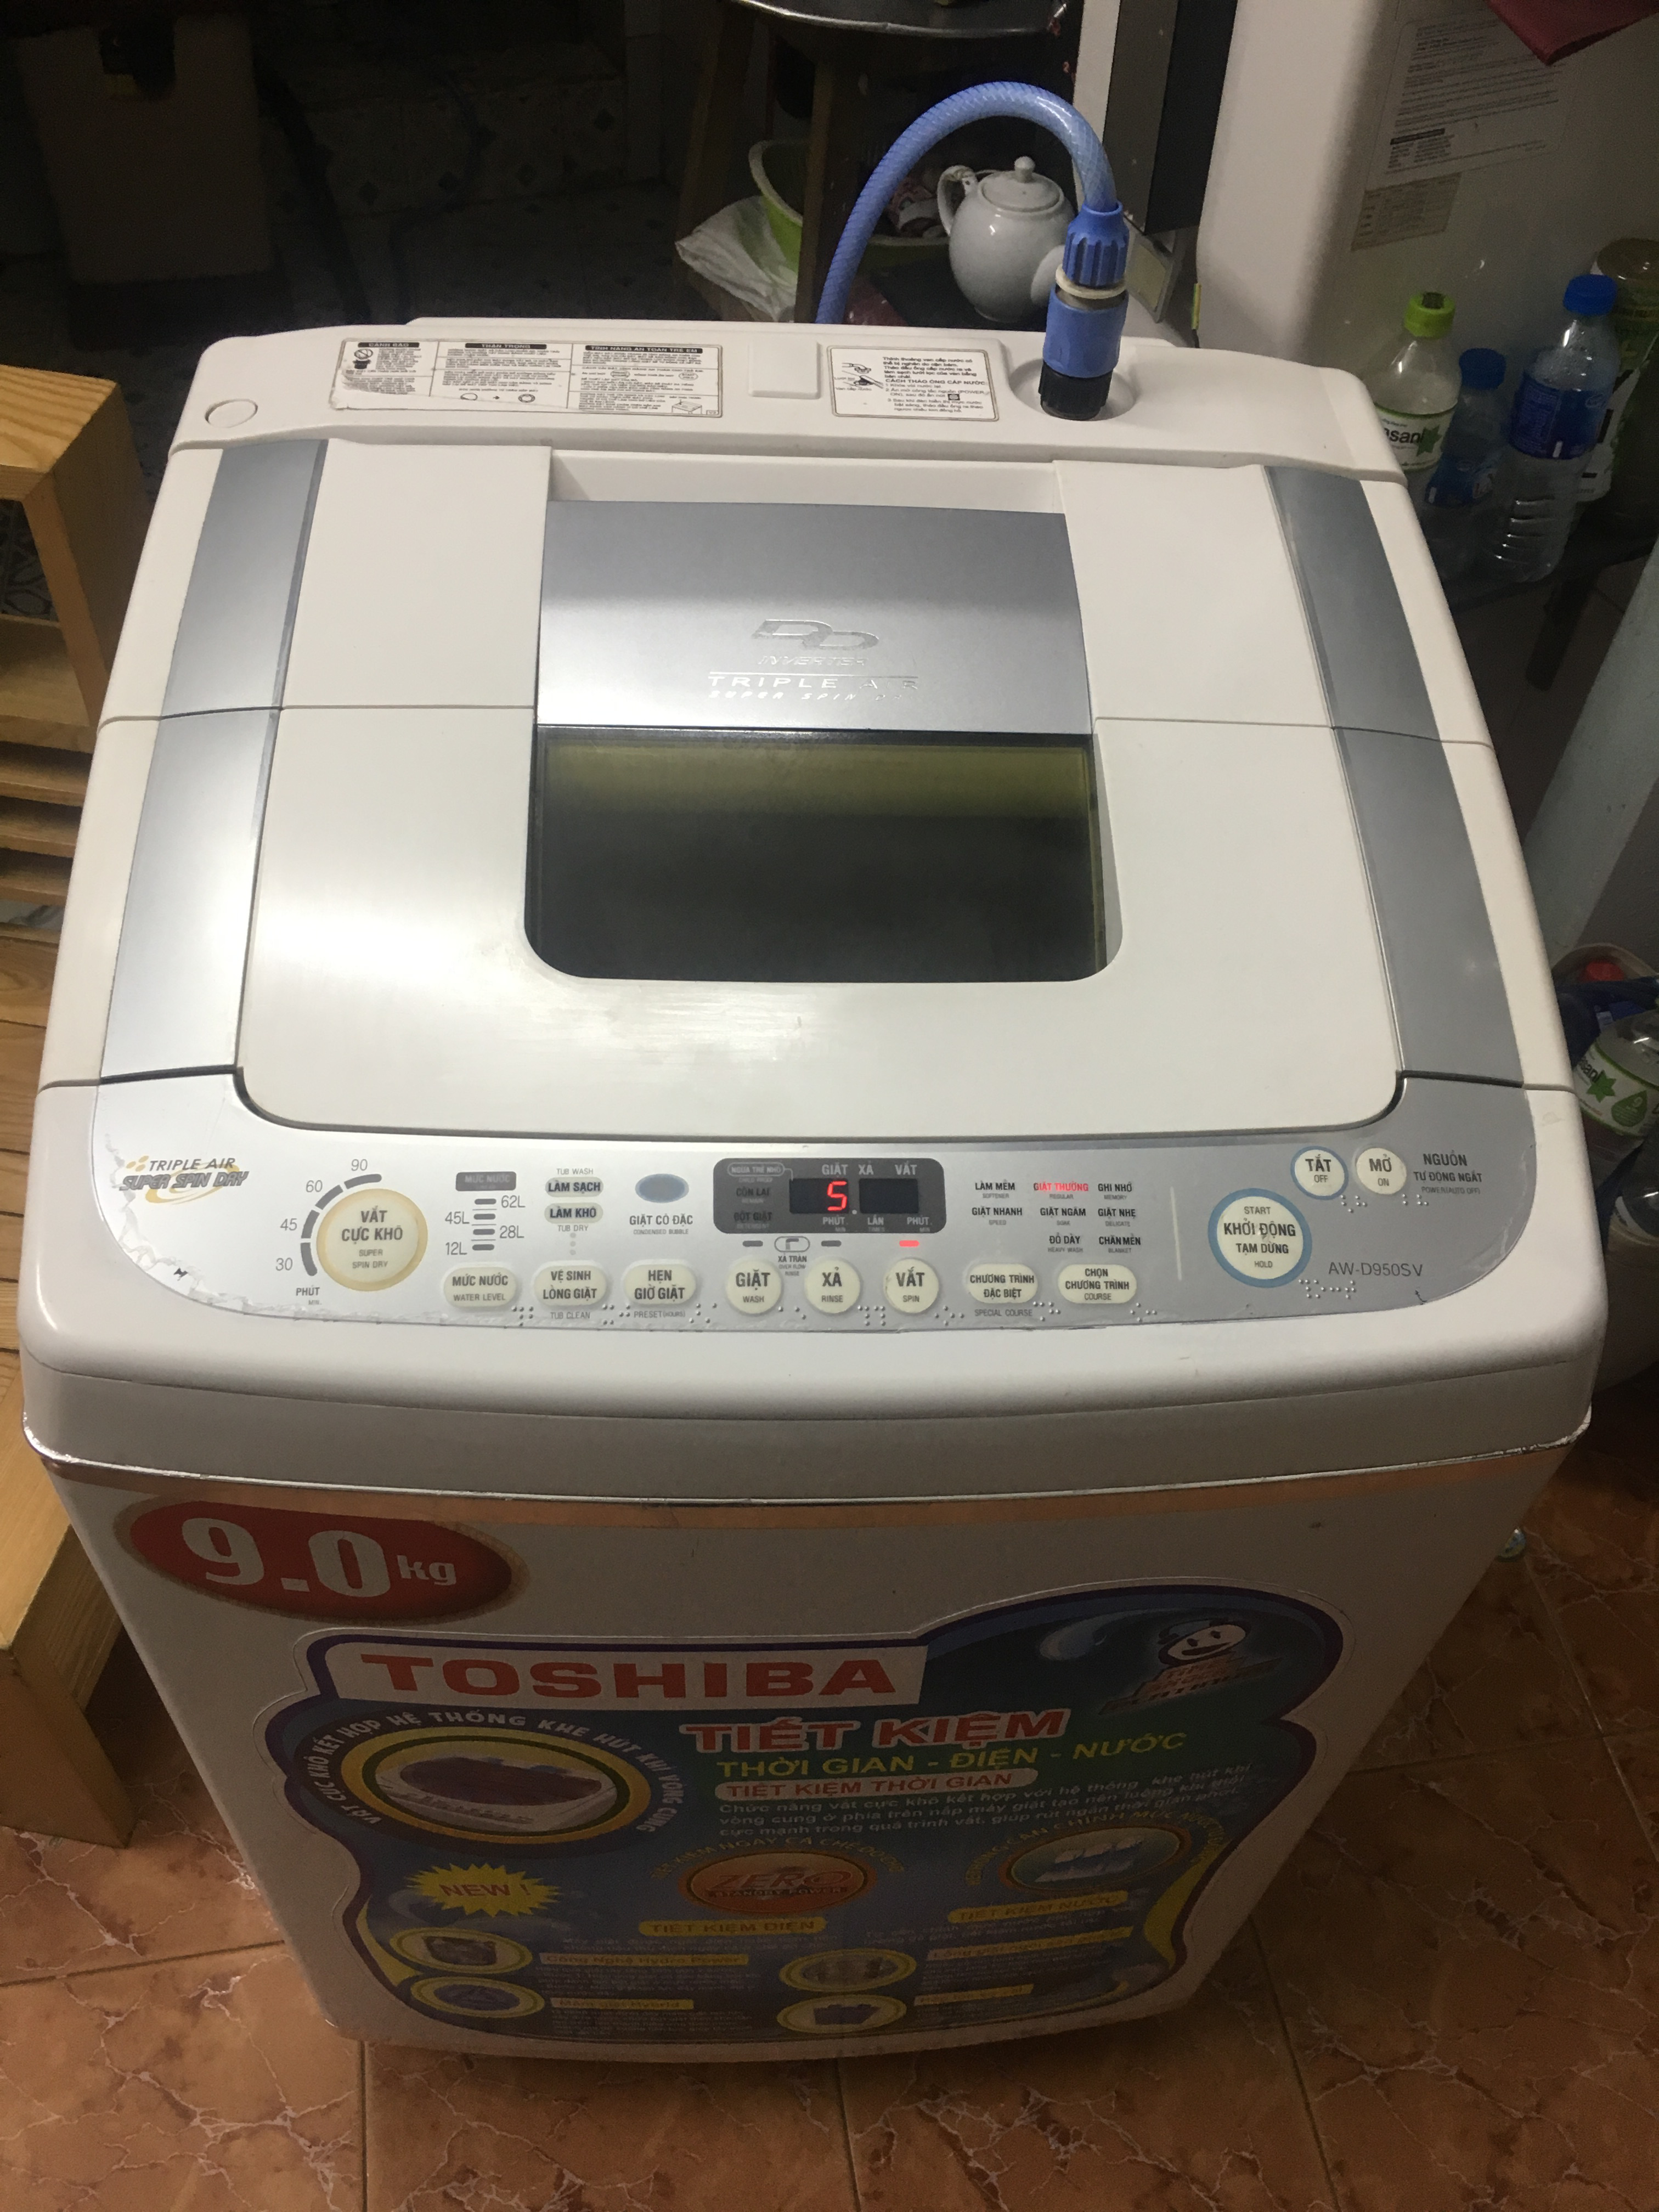 1 Máy giặt toshiba inveter 9kg giặt cực êm